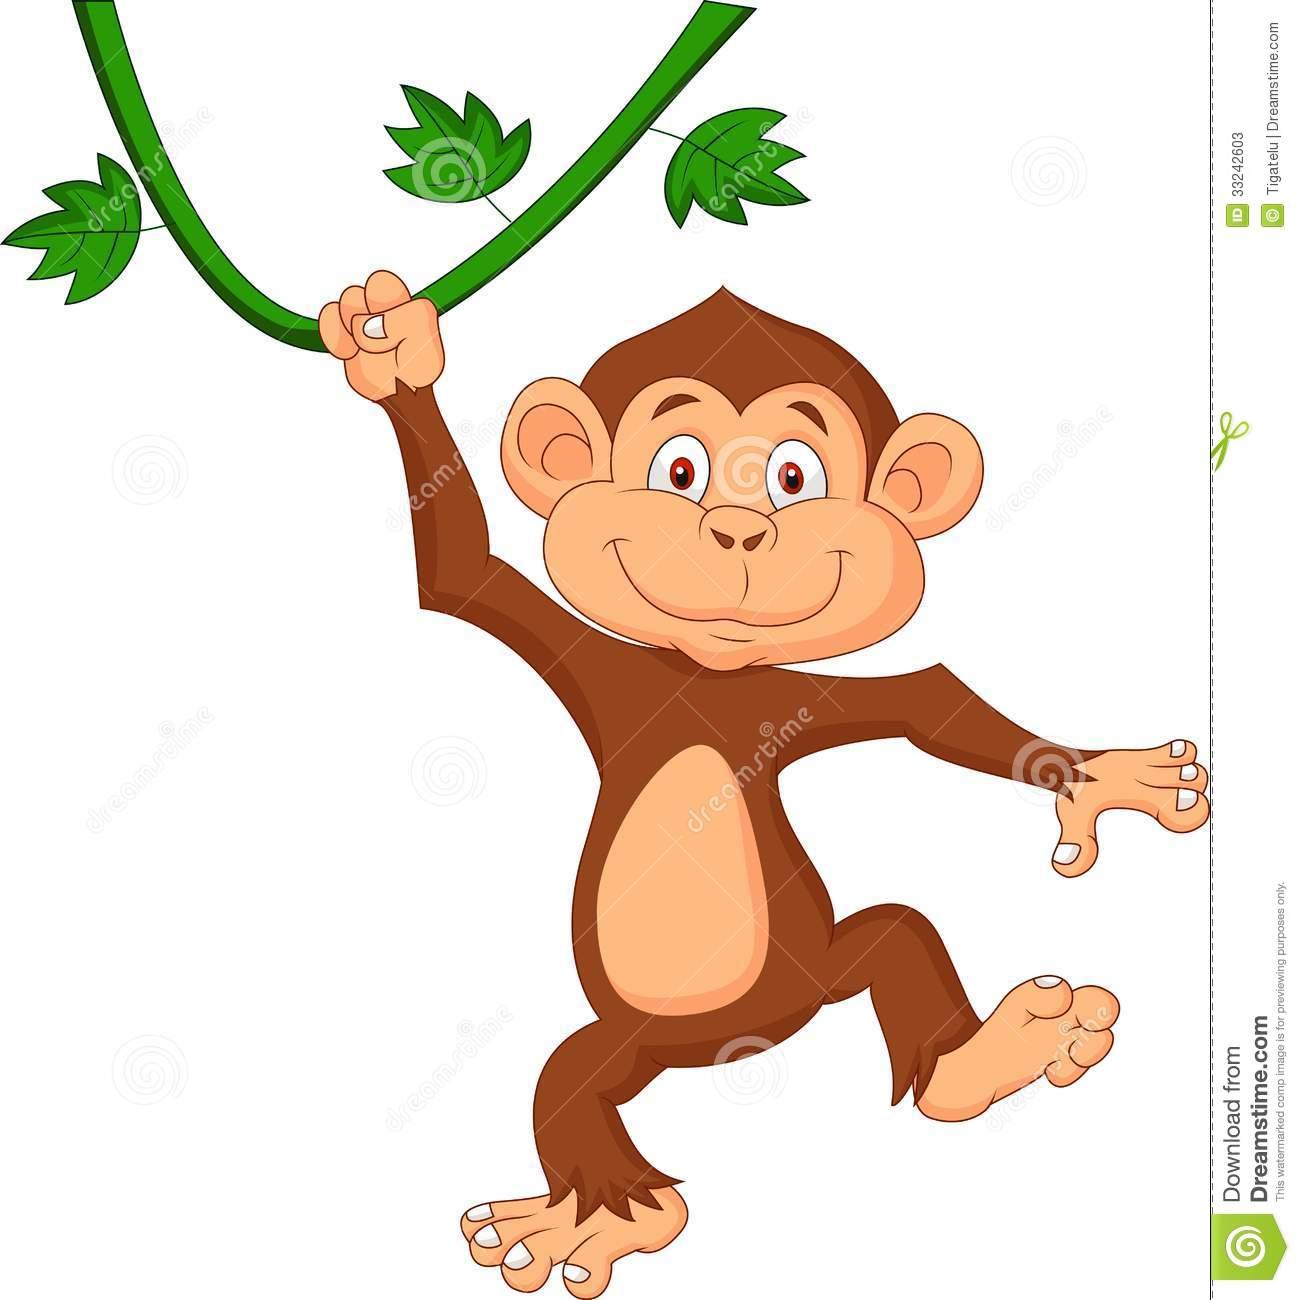 1300x1300 Hanging Monkey Cartoon Cute Monkey Cartoon Hanging Illustration